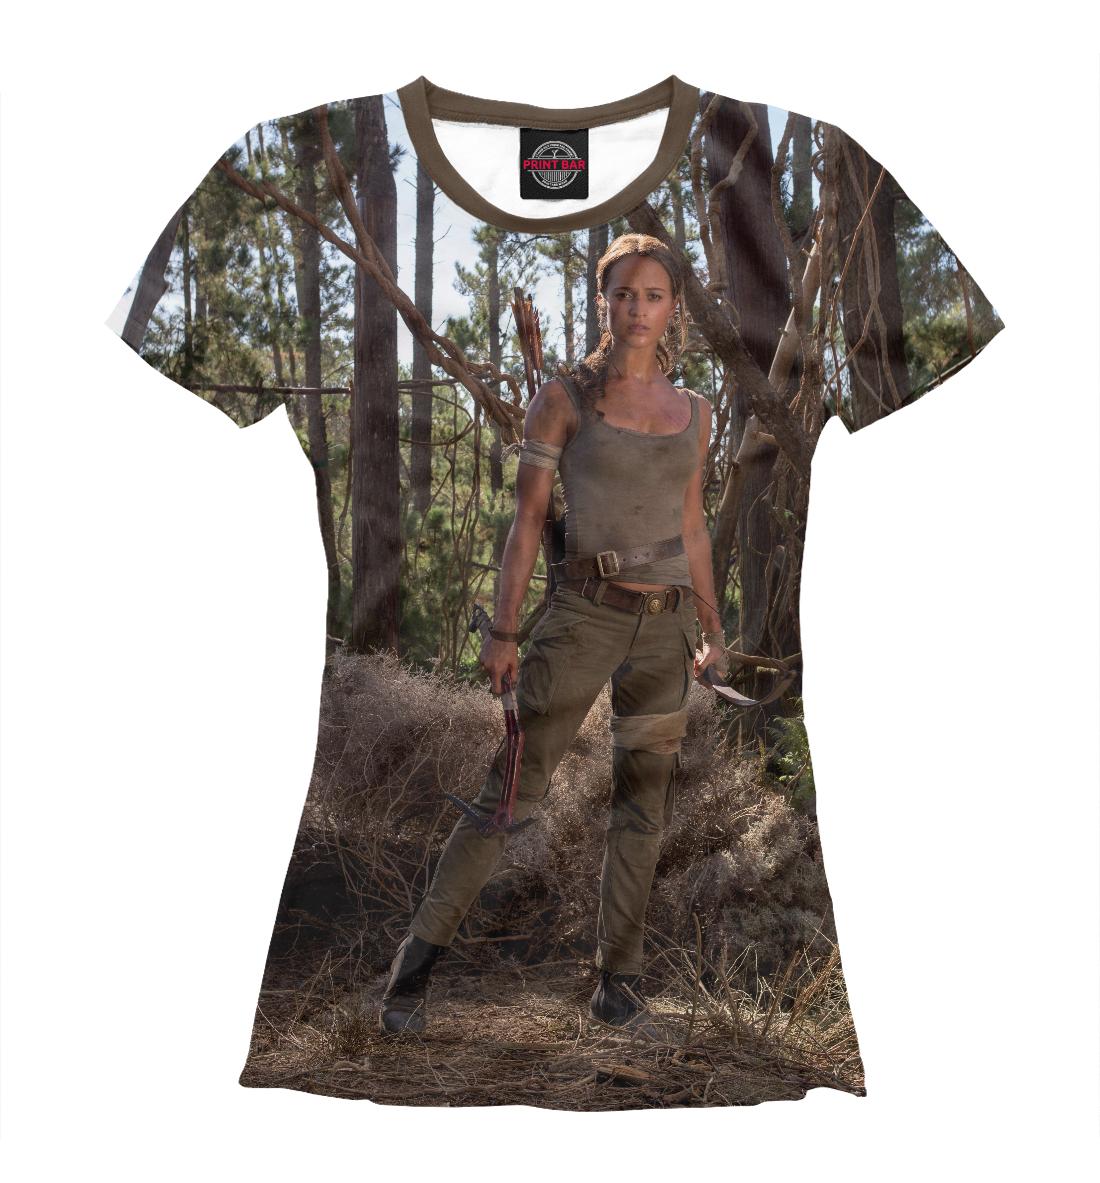 Купить Tomb Raider, Printbar, Футболки, KNO-658921-fut-1